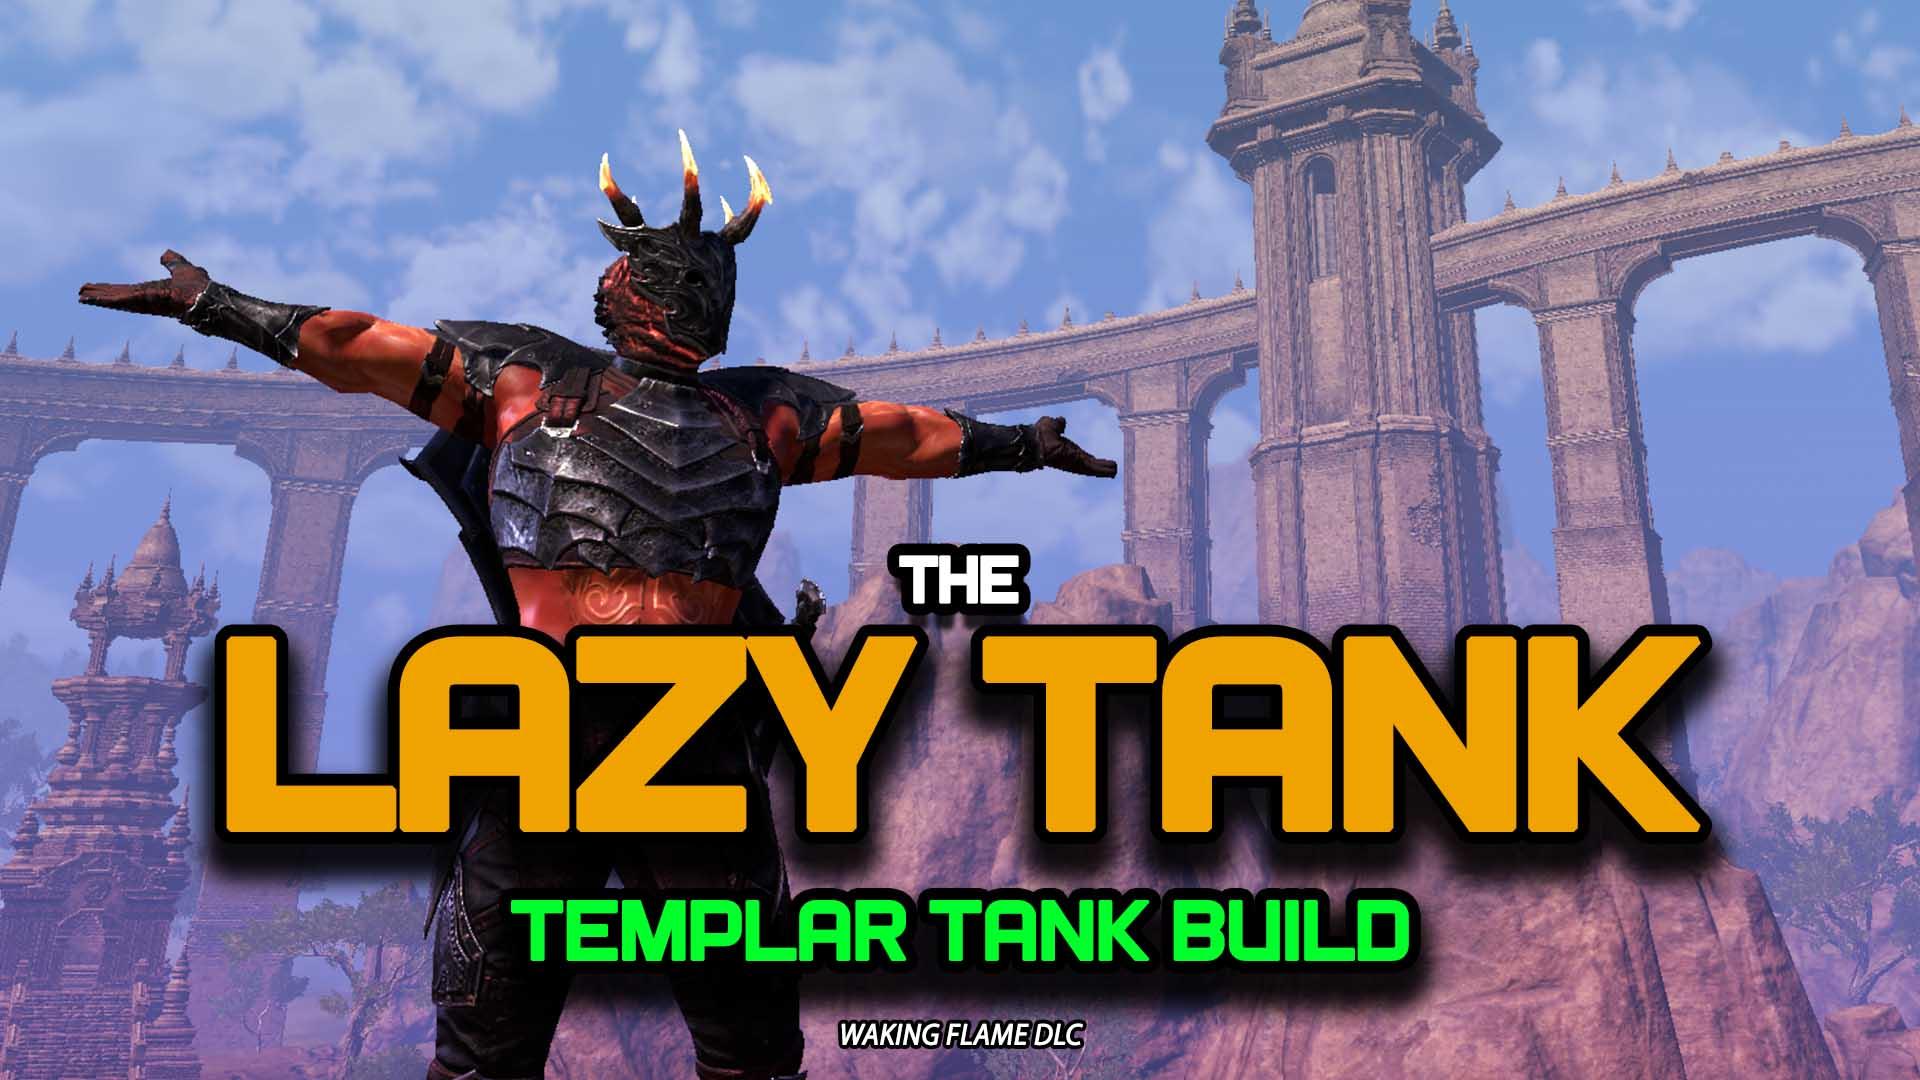 lazy tank, selfish tank, best tank, eso tank, elder scrolls online tank, templar tank, tankplar, xynode tank, eso tank build, eso templar tank build, waking flame